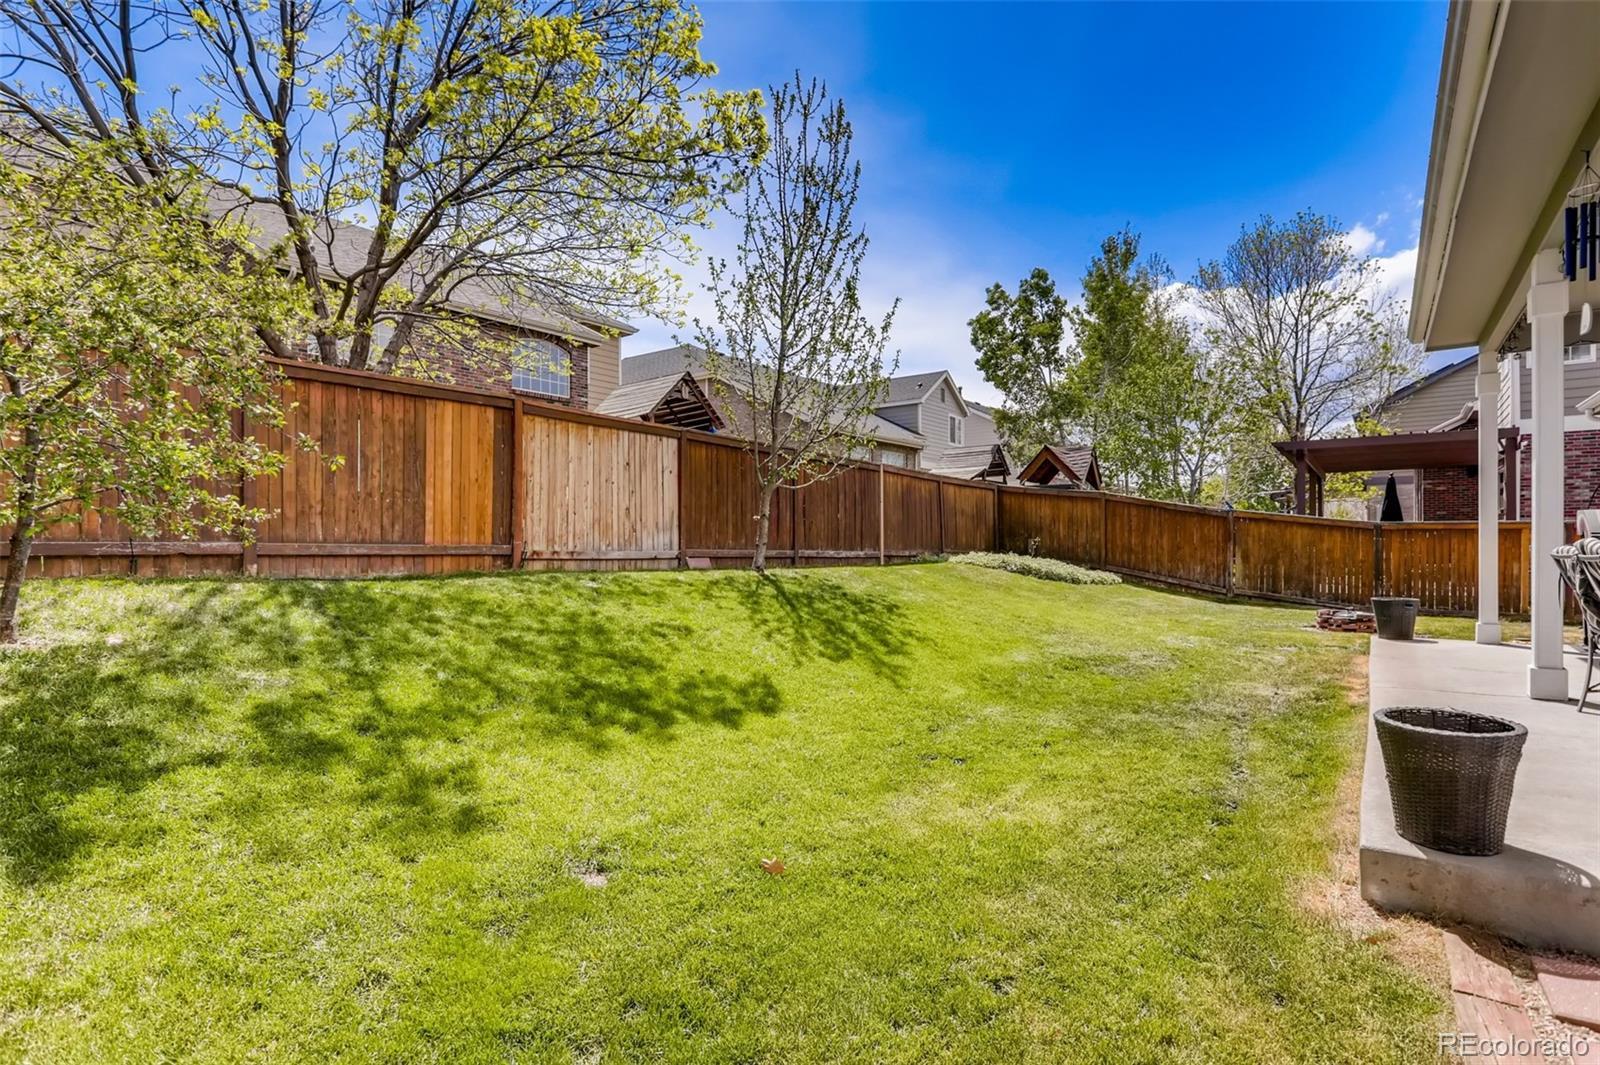 MLS# 5875939 - 33 - 7334 E Cedar Avenue, Denver, CO 80230